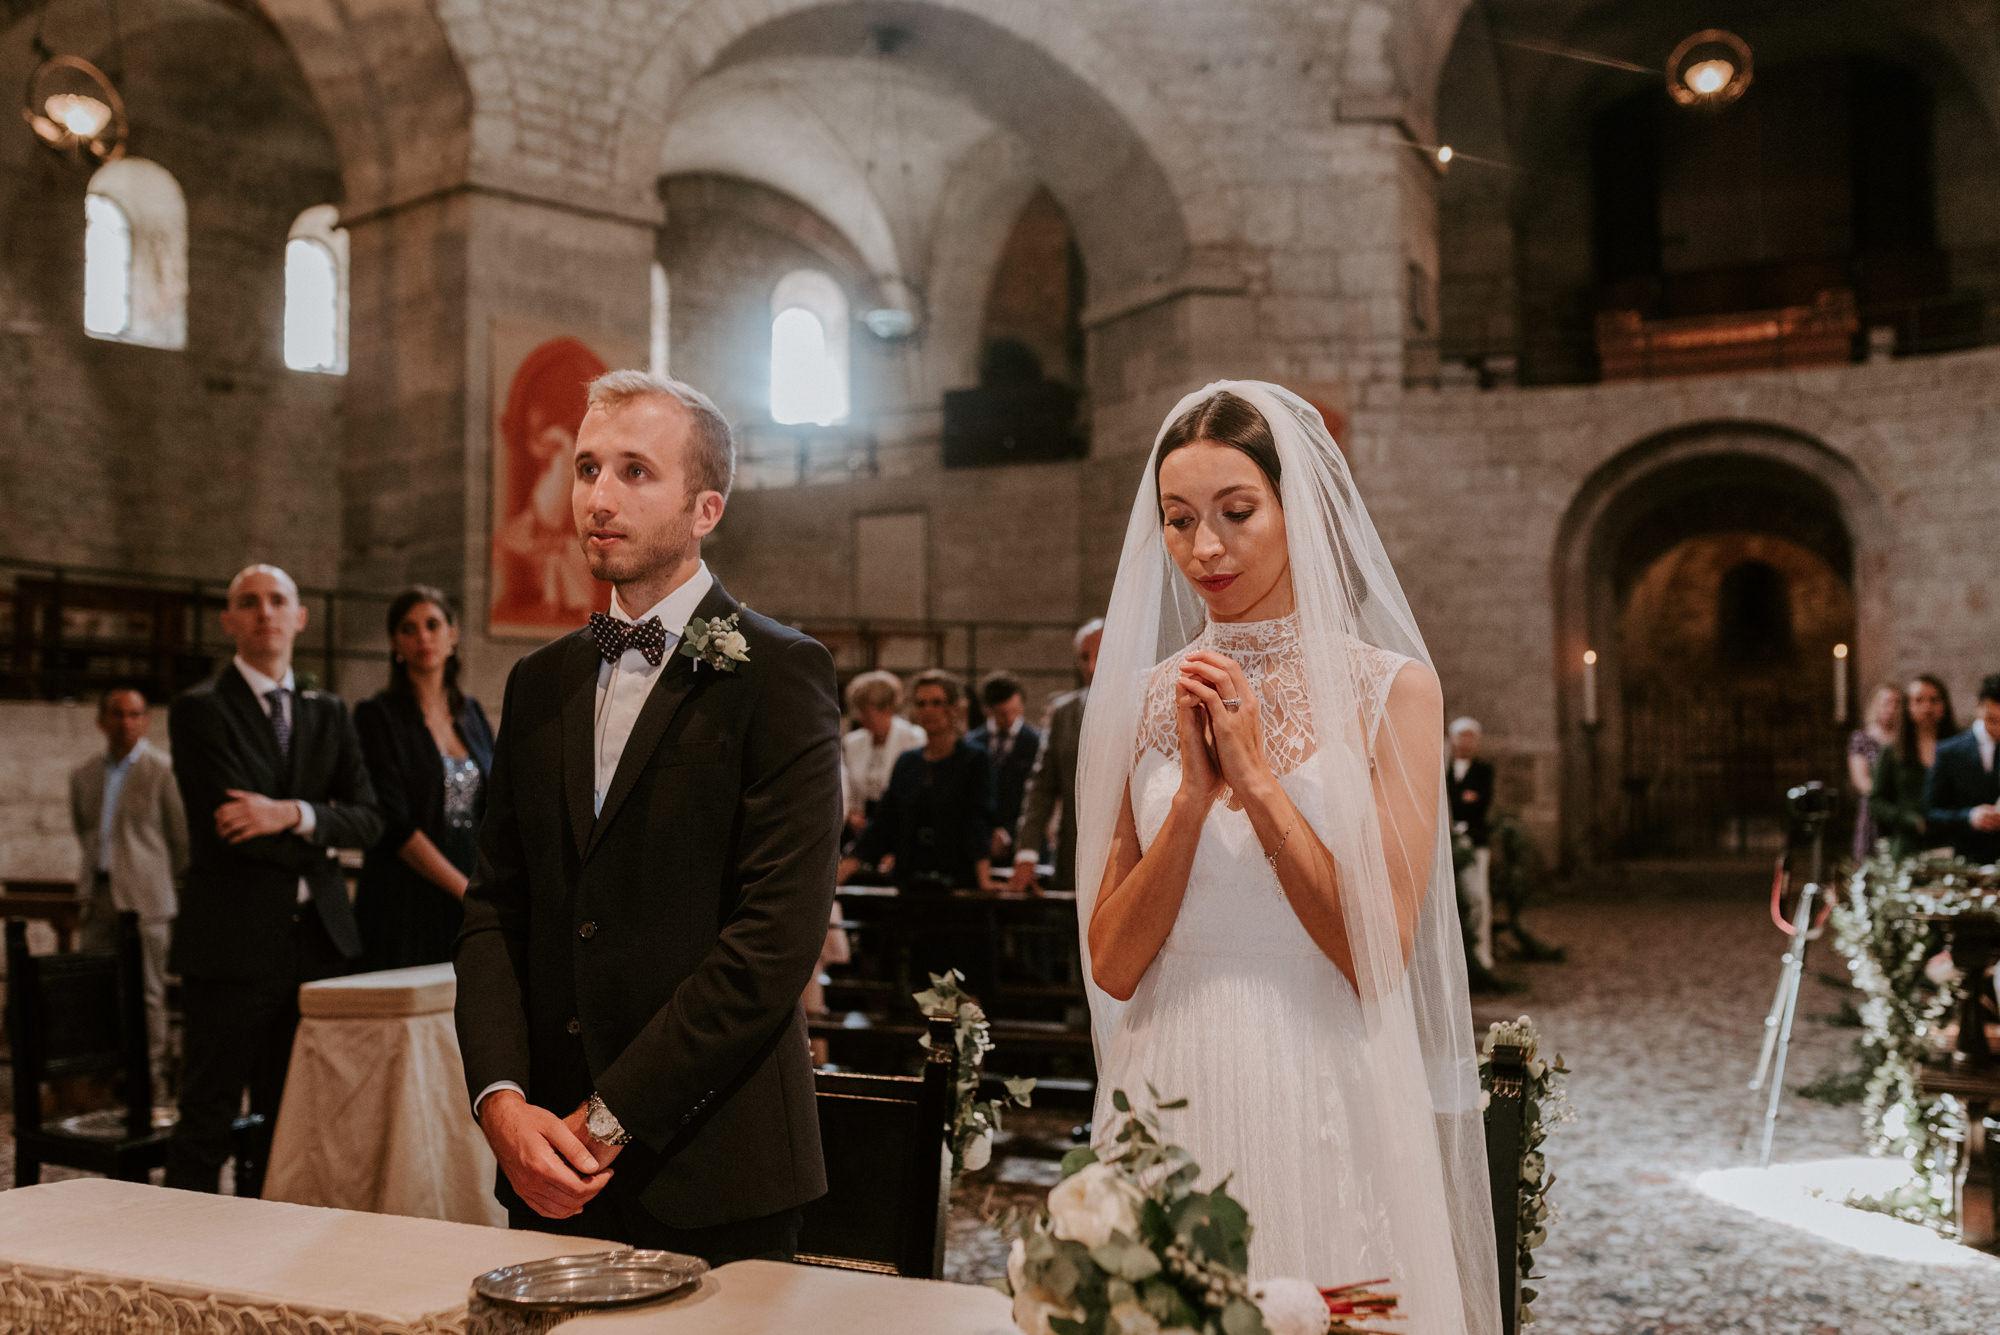 FOTO+PHOTO+BODA+WEDDING+ITALIA+ITALY+MAURICIO+GARAY+MAURICIOGARAY+WEDDINPHOTOGRAPHER+FOTOGRAFODEBODA-955.jpg